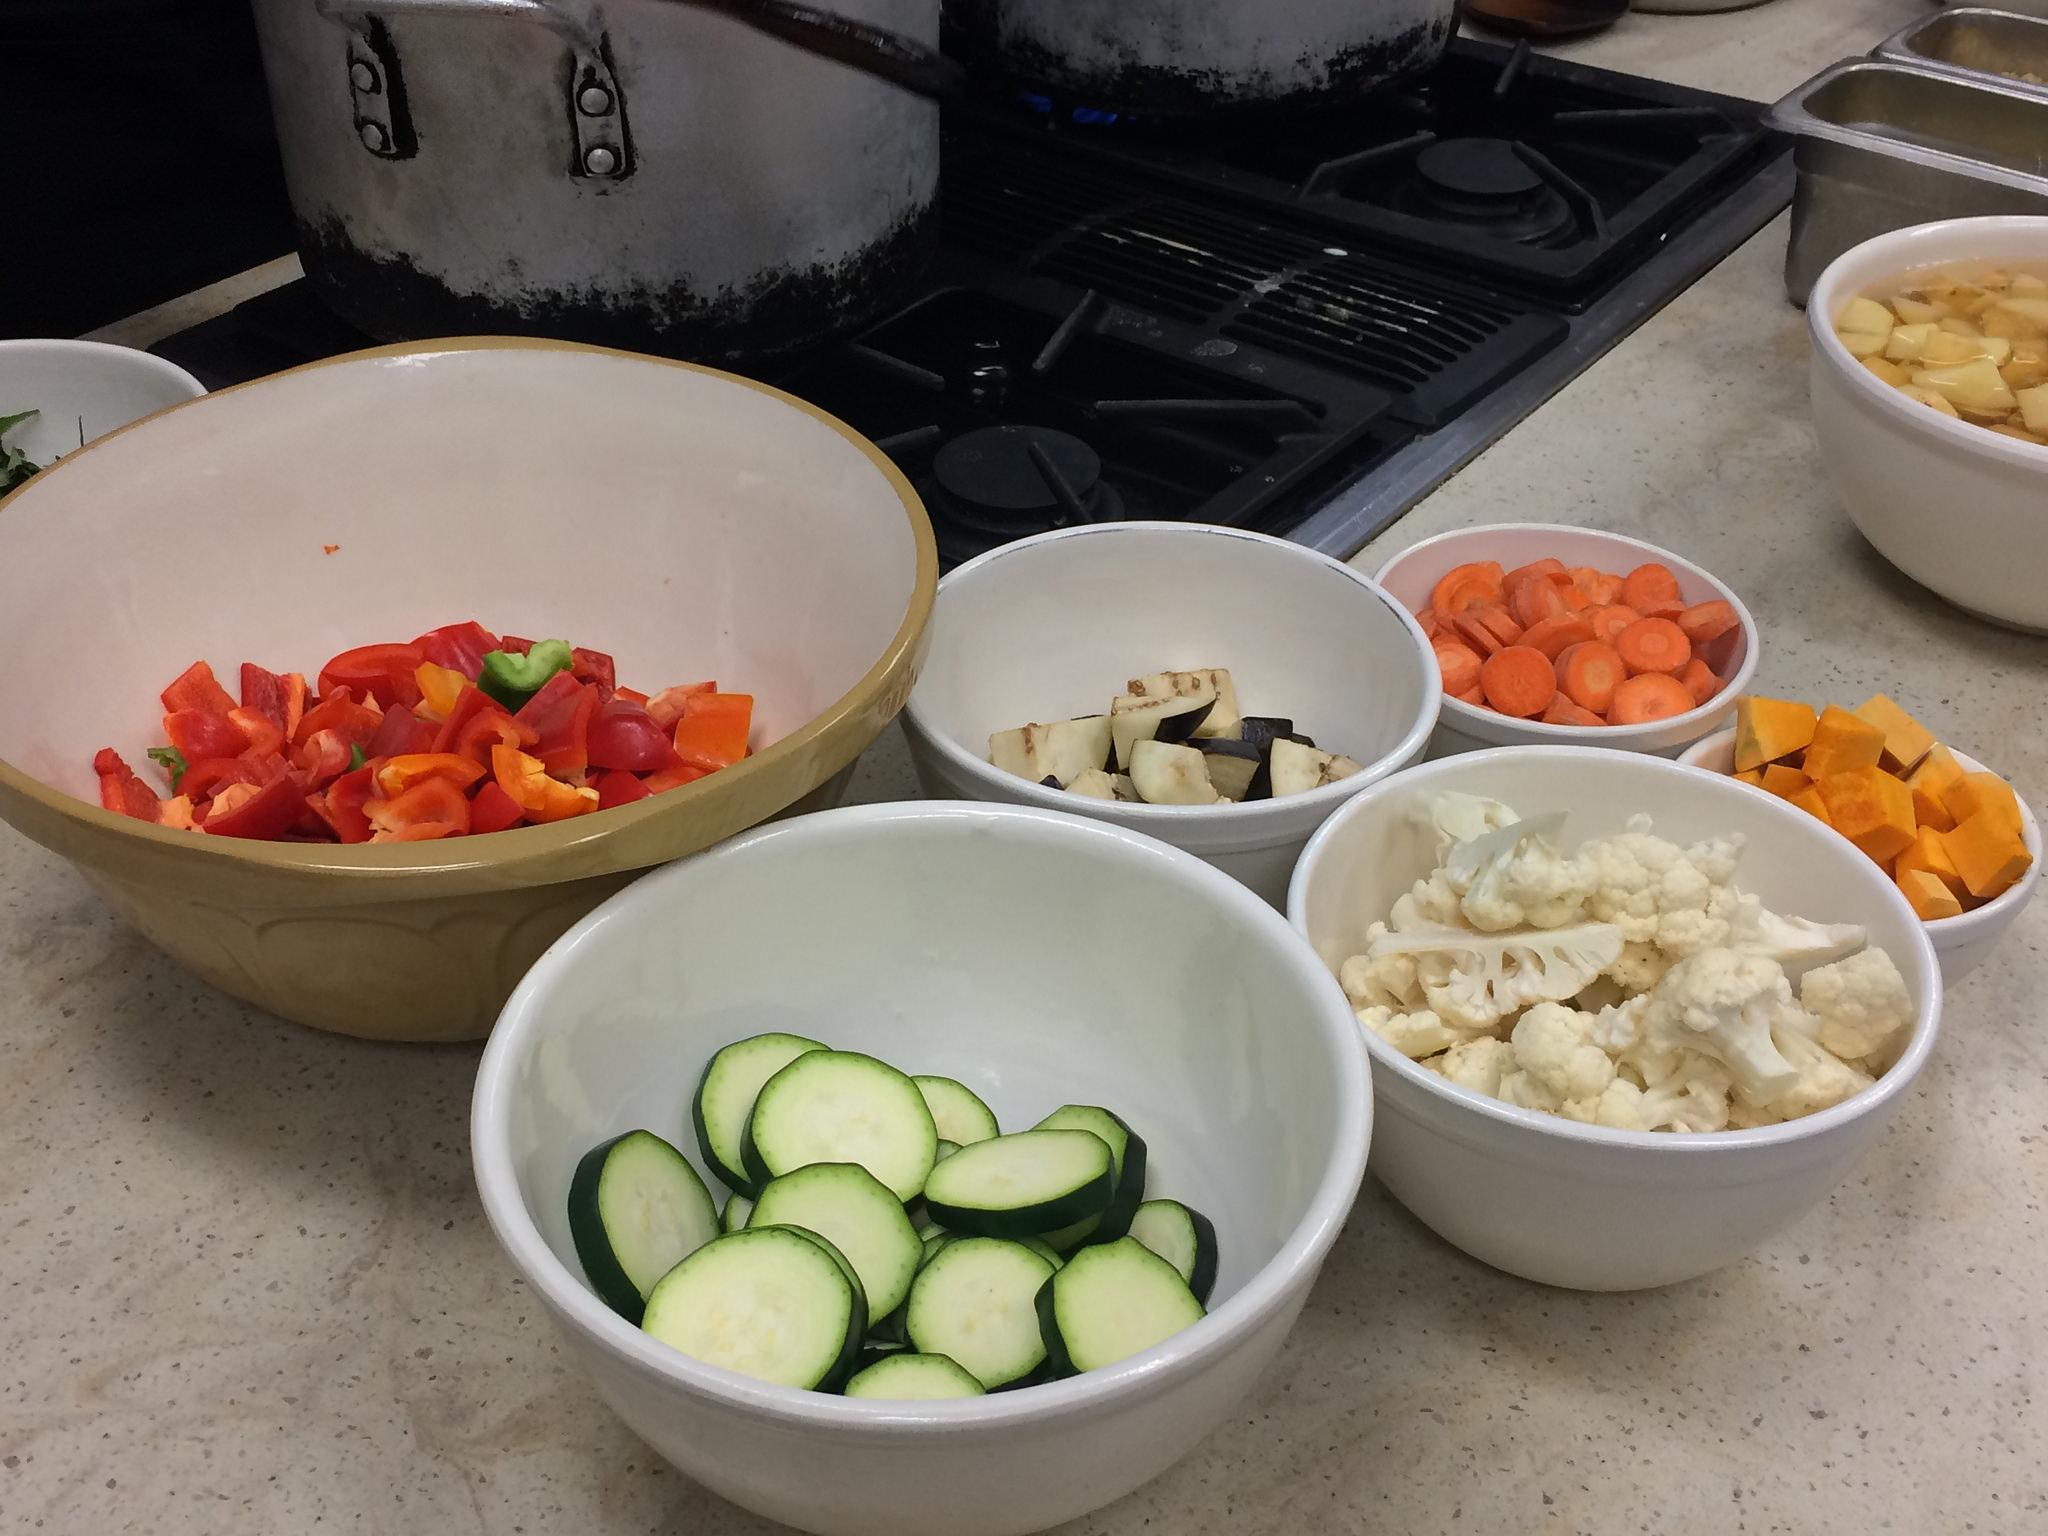 We included all these fresh, colorful veggies!  إستخدمنا كل هاي الخضراوات والألوان للكاري.